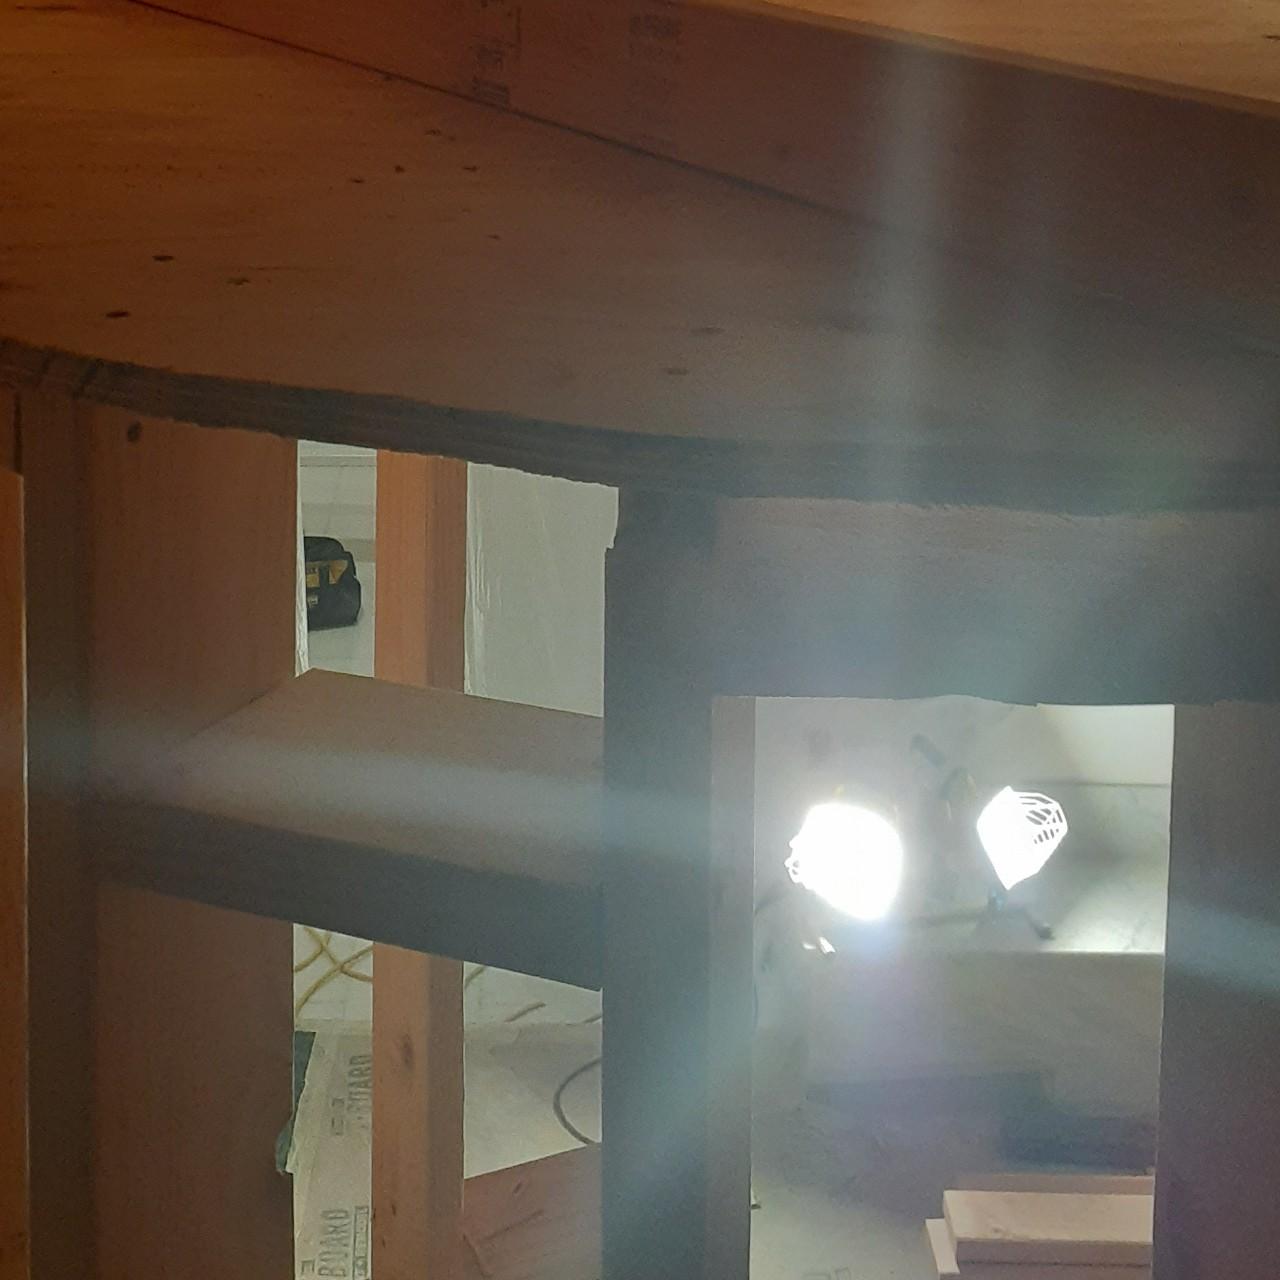 carpentry-wood-framing-second-floor-home-addition--framing-45